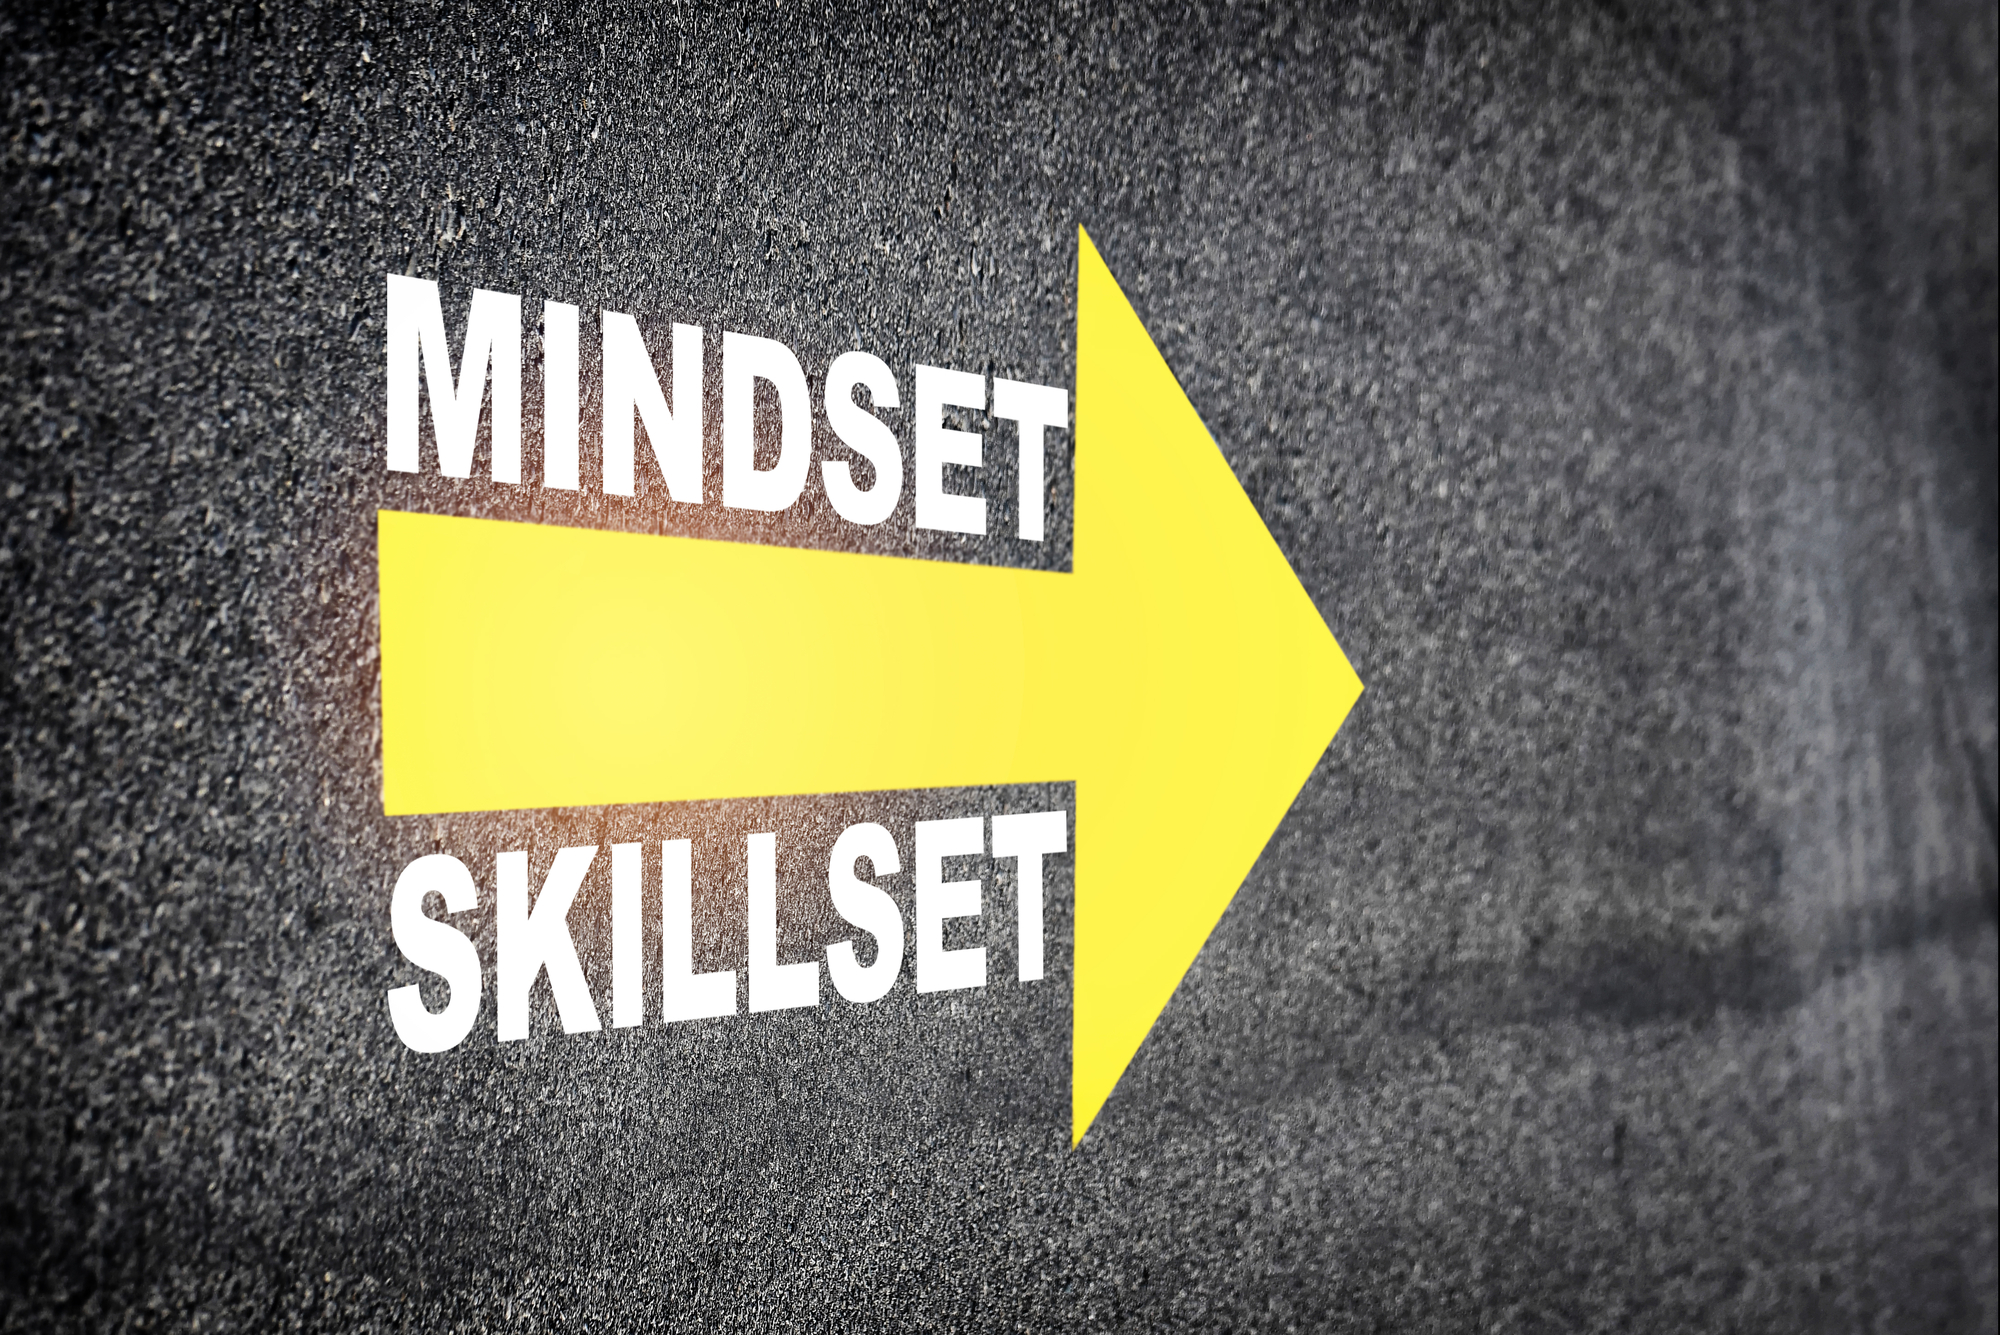 Teen Driving Mindset and Skillset - DPDH